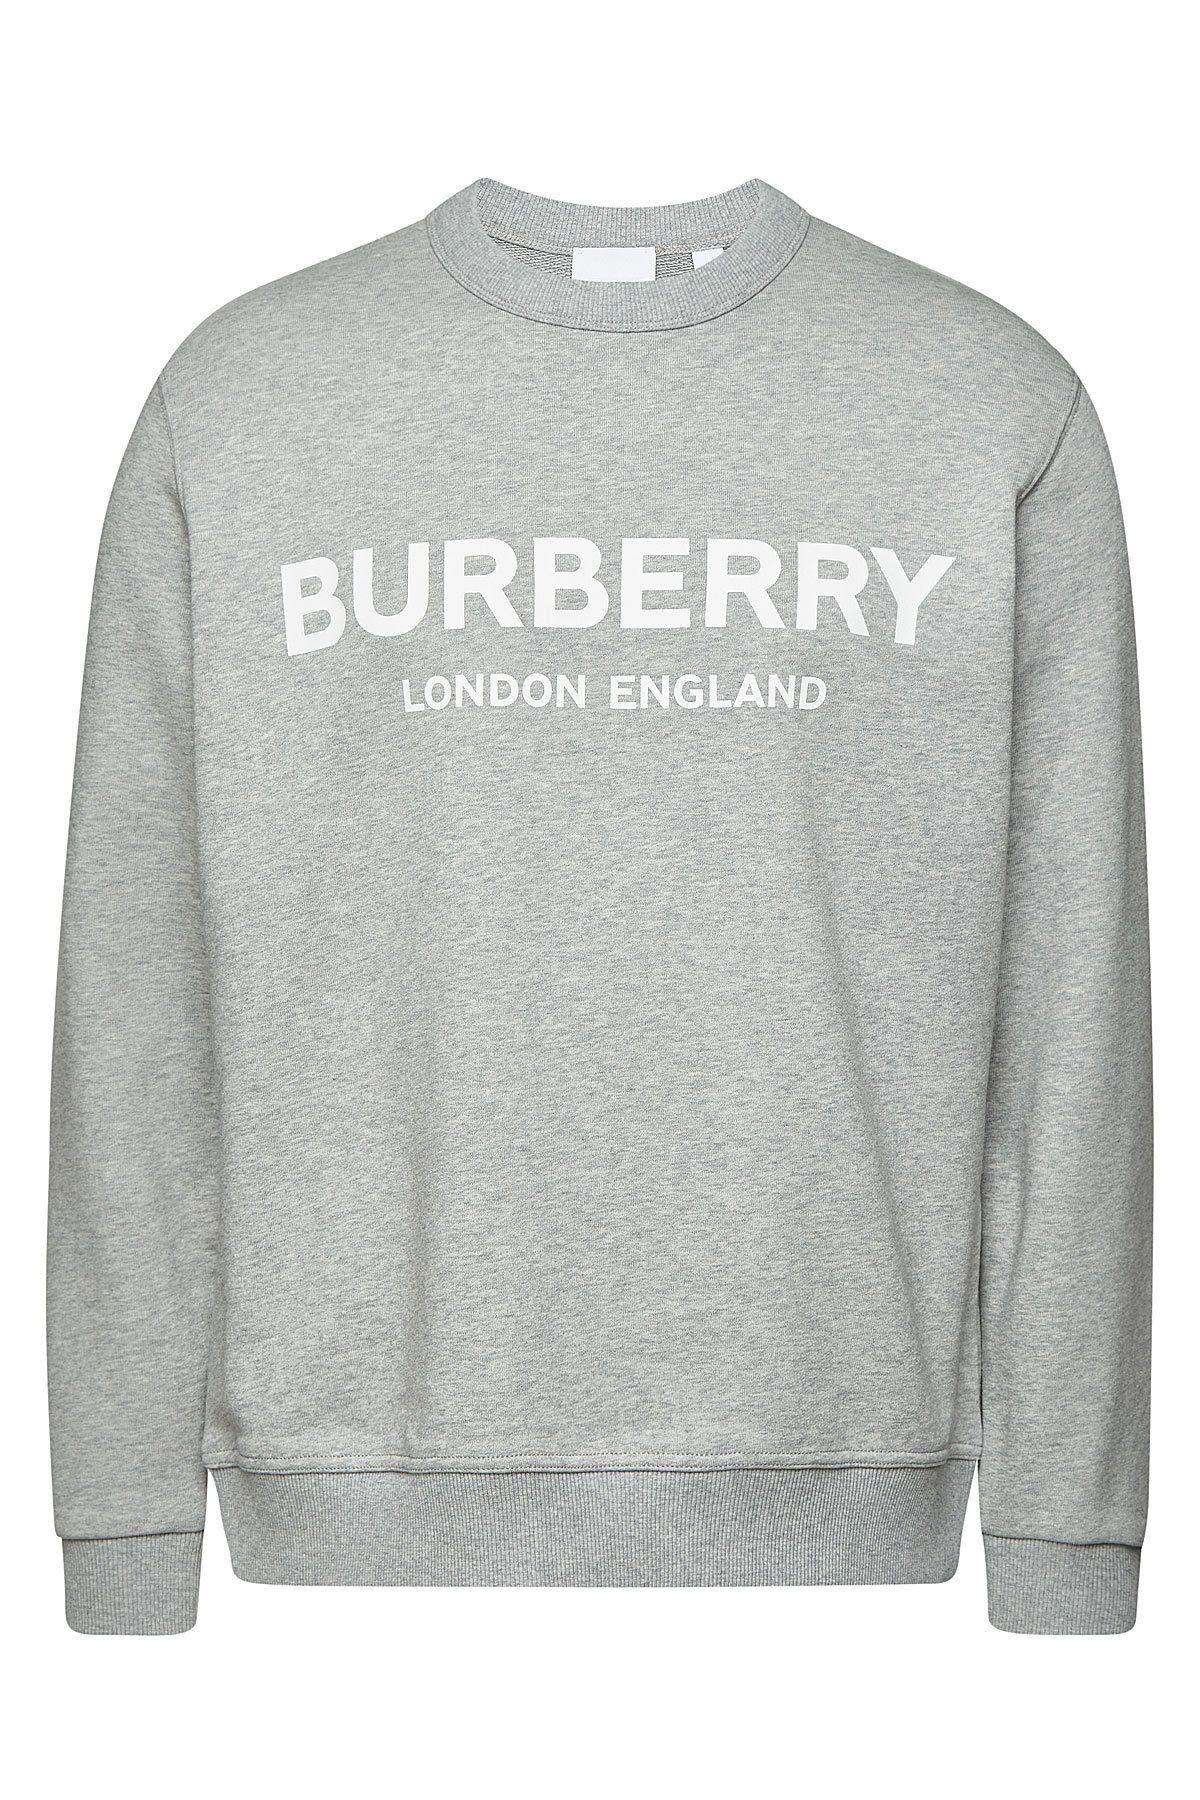 Burberry Cotton Lexstone Hoody In Black Modesens Burberry Hoodie Hoodies Burberry [ 1800 x 1200 Pixel ]